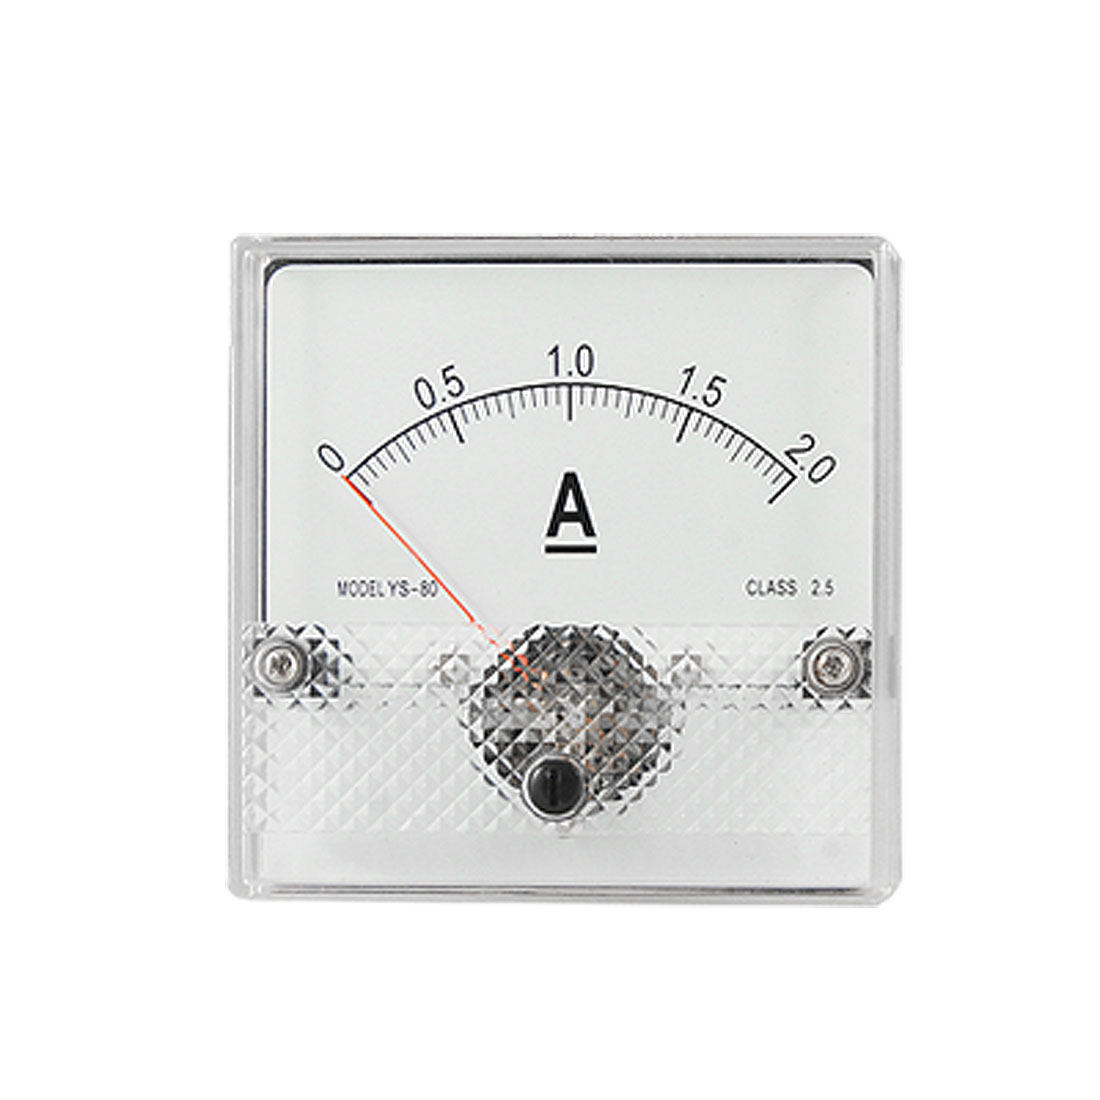 YS-80 Analogue DC Current Aquare Panel Meter Amperemeter Gauge 0-2A